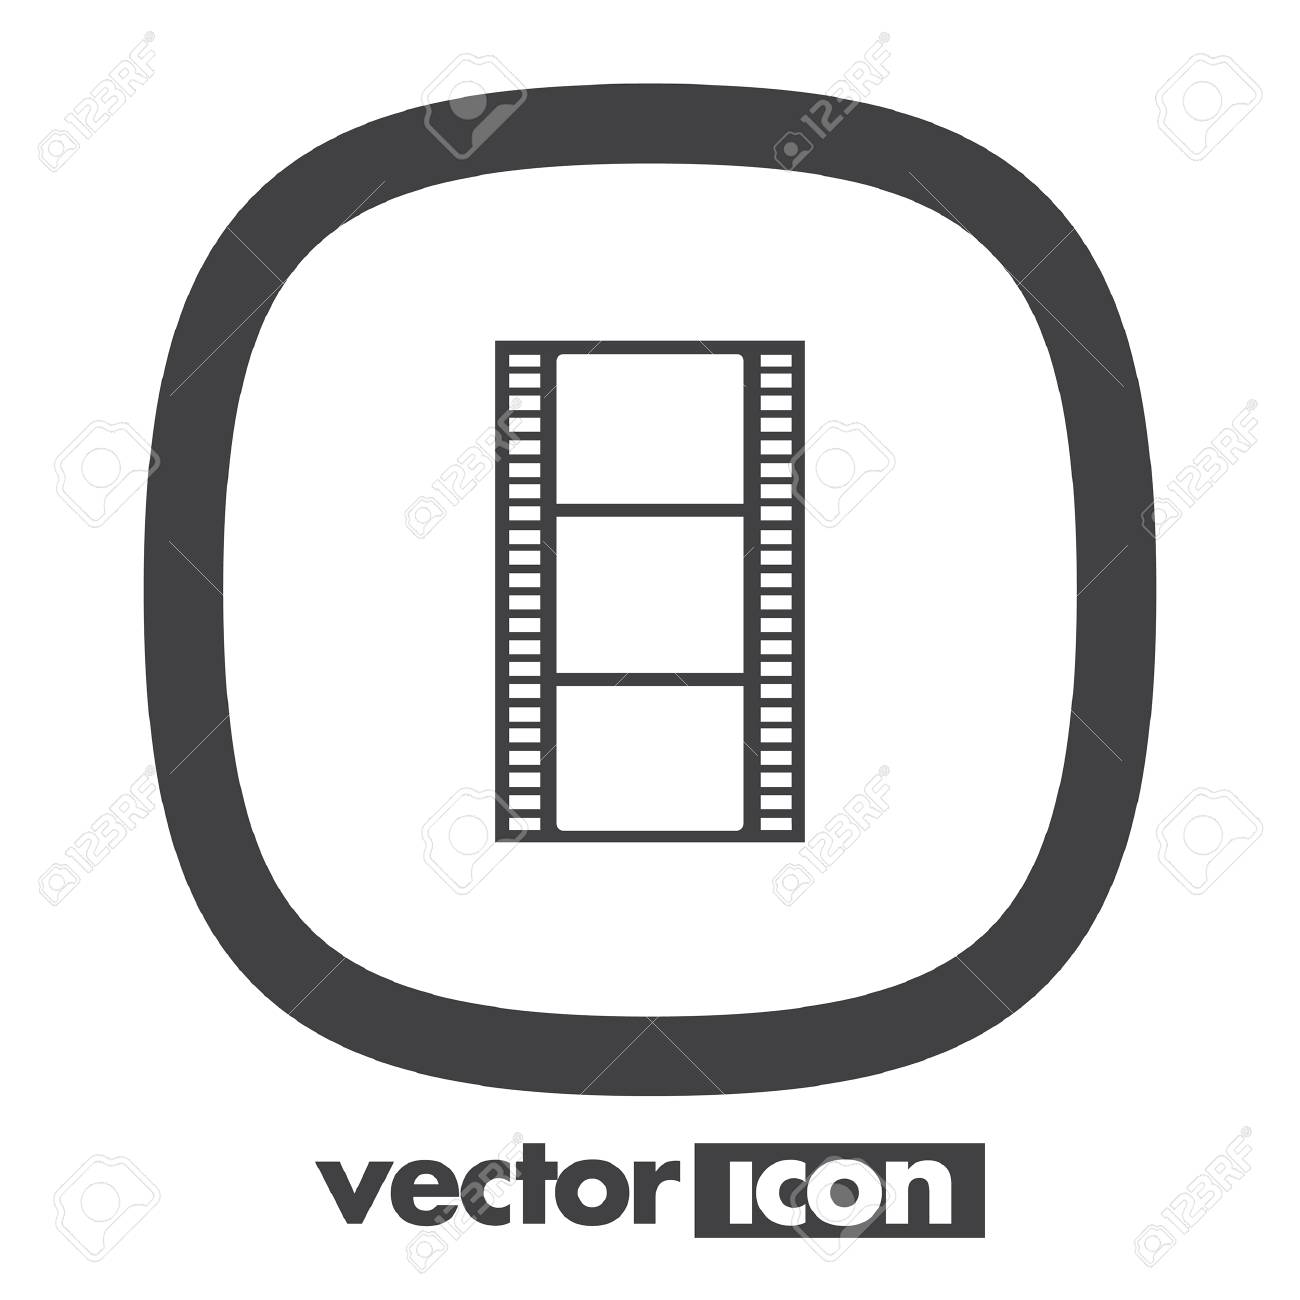 Movie Film Strip Vector Icon Royalty Free Cliparts Vectors And